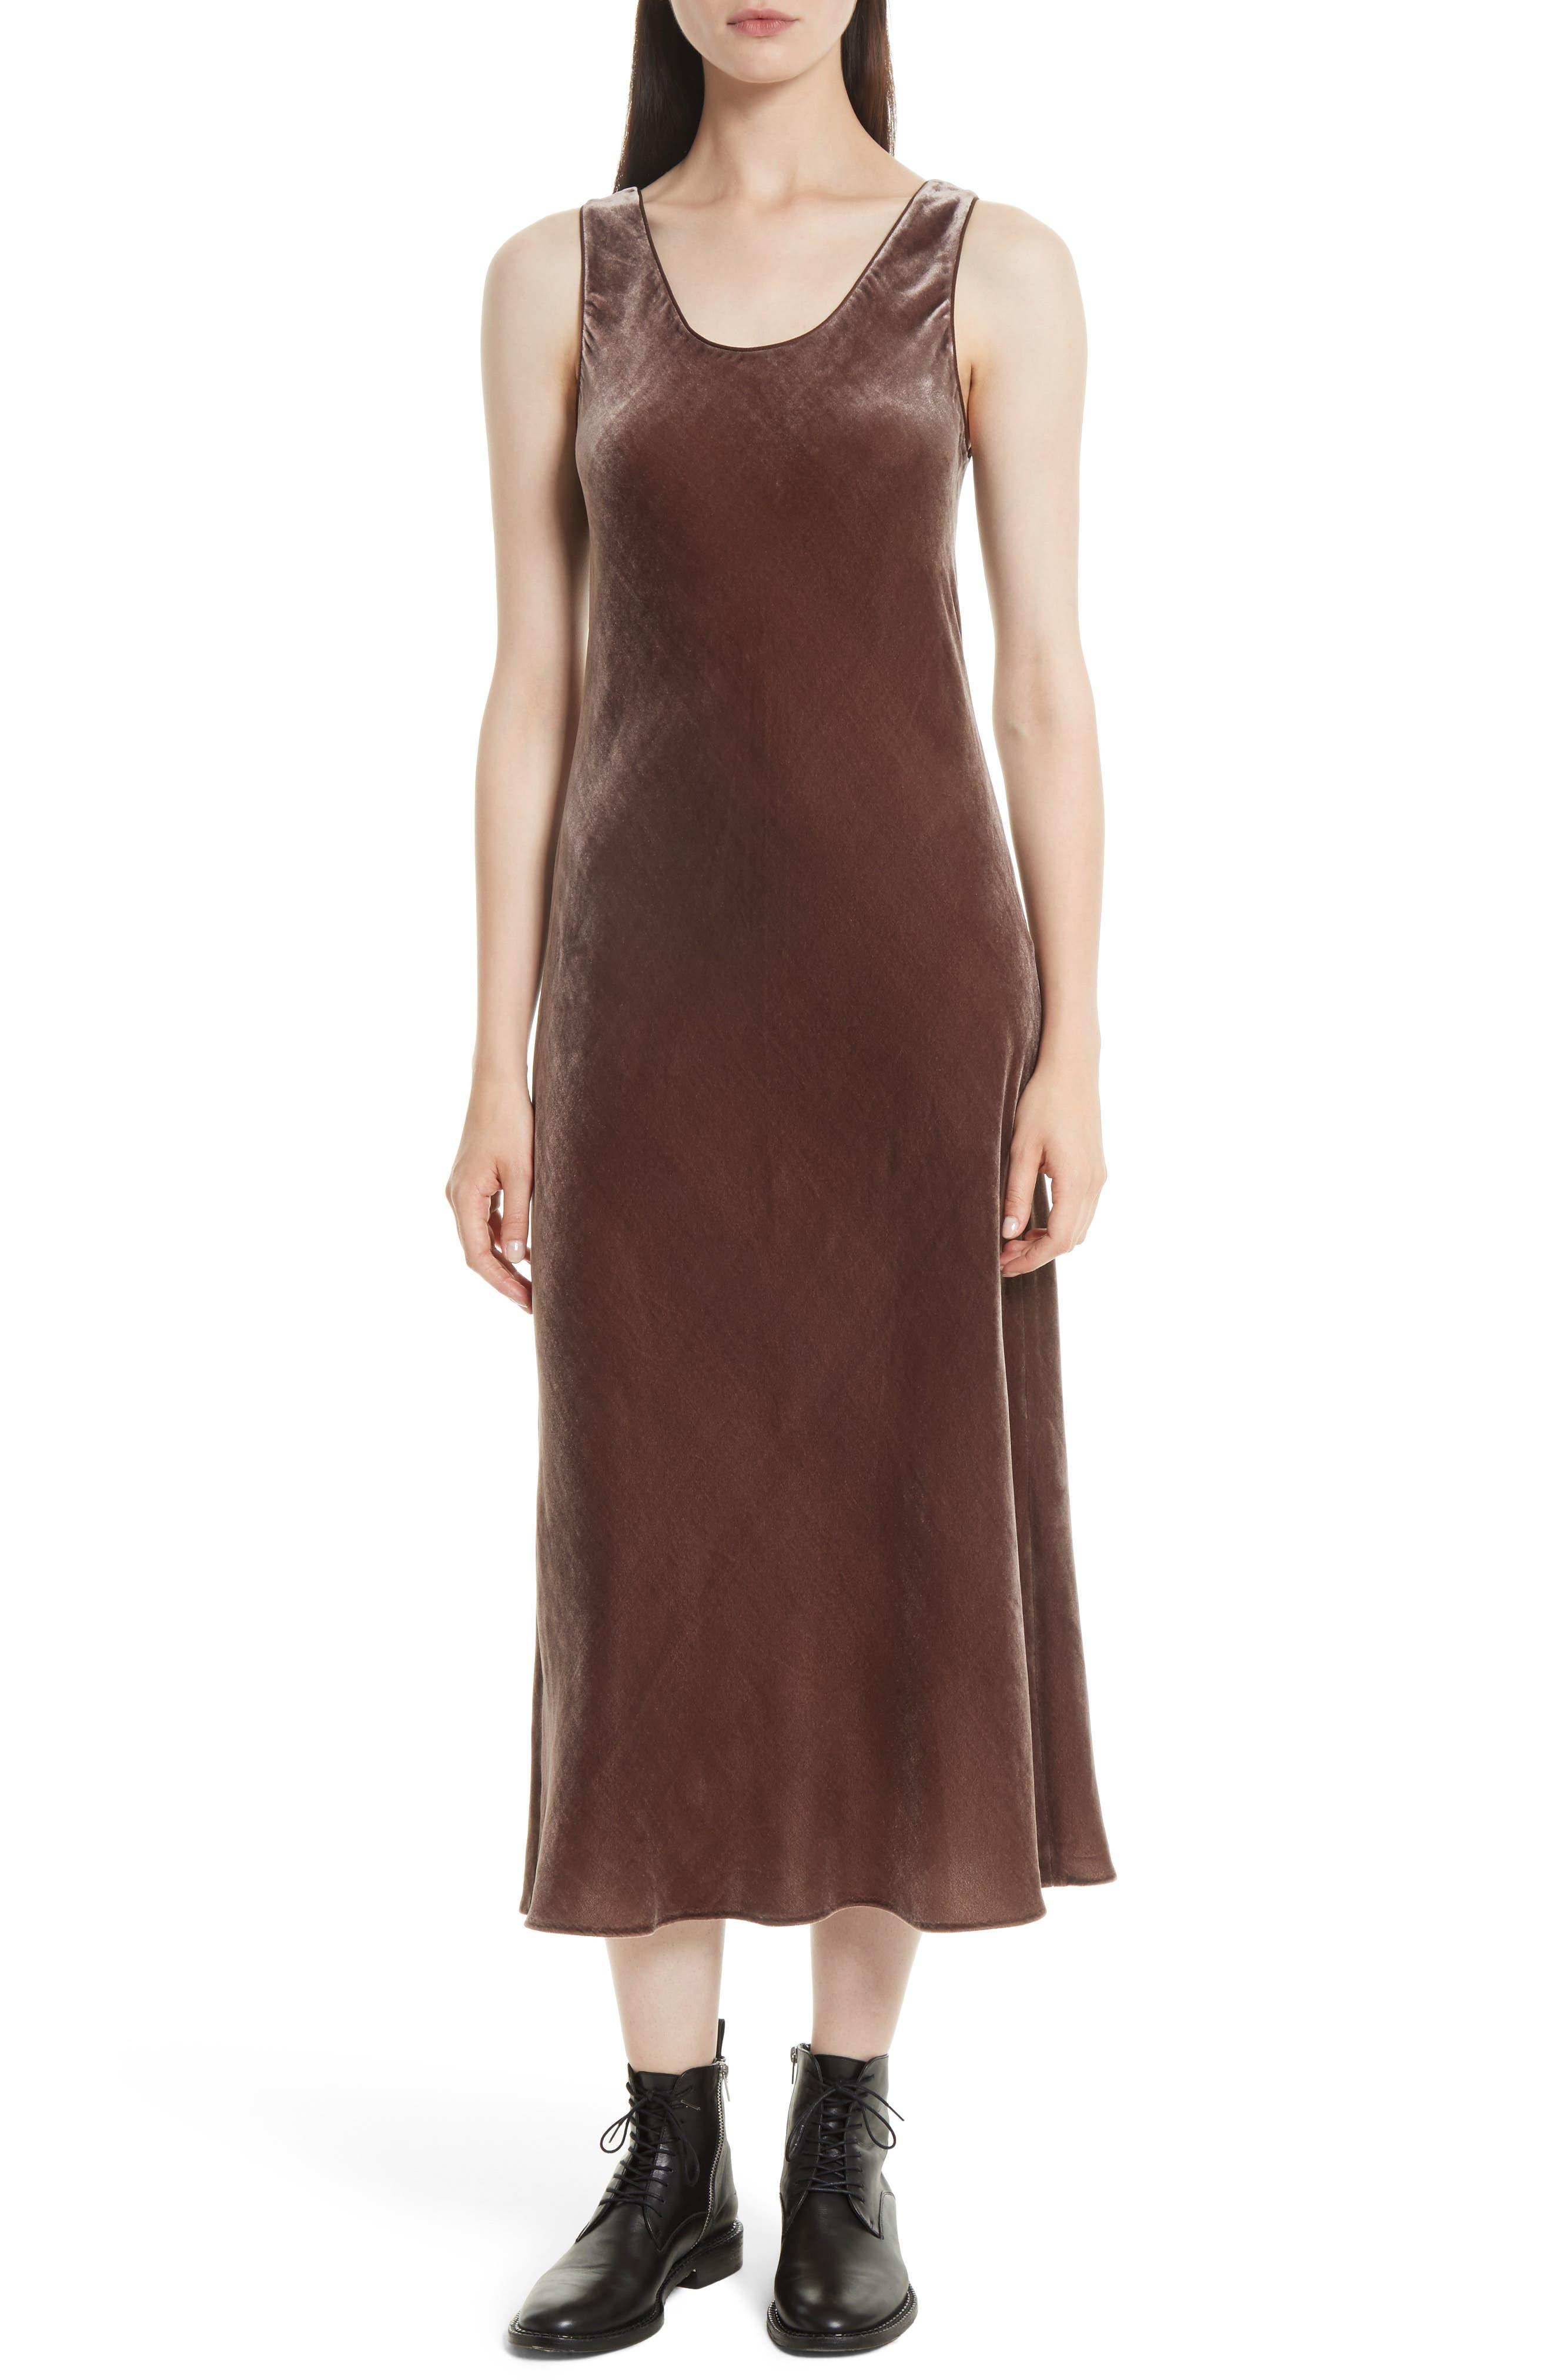 Velvet Tank Dress,                             Main thumbnail 1, color,                             243